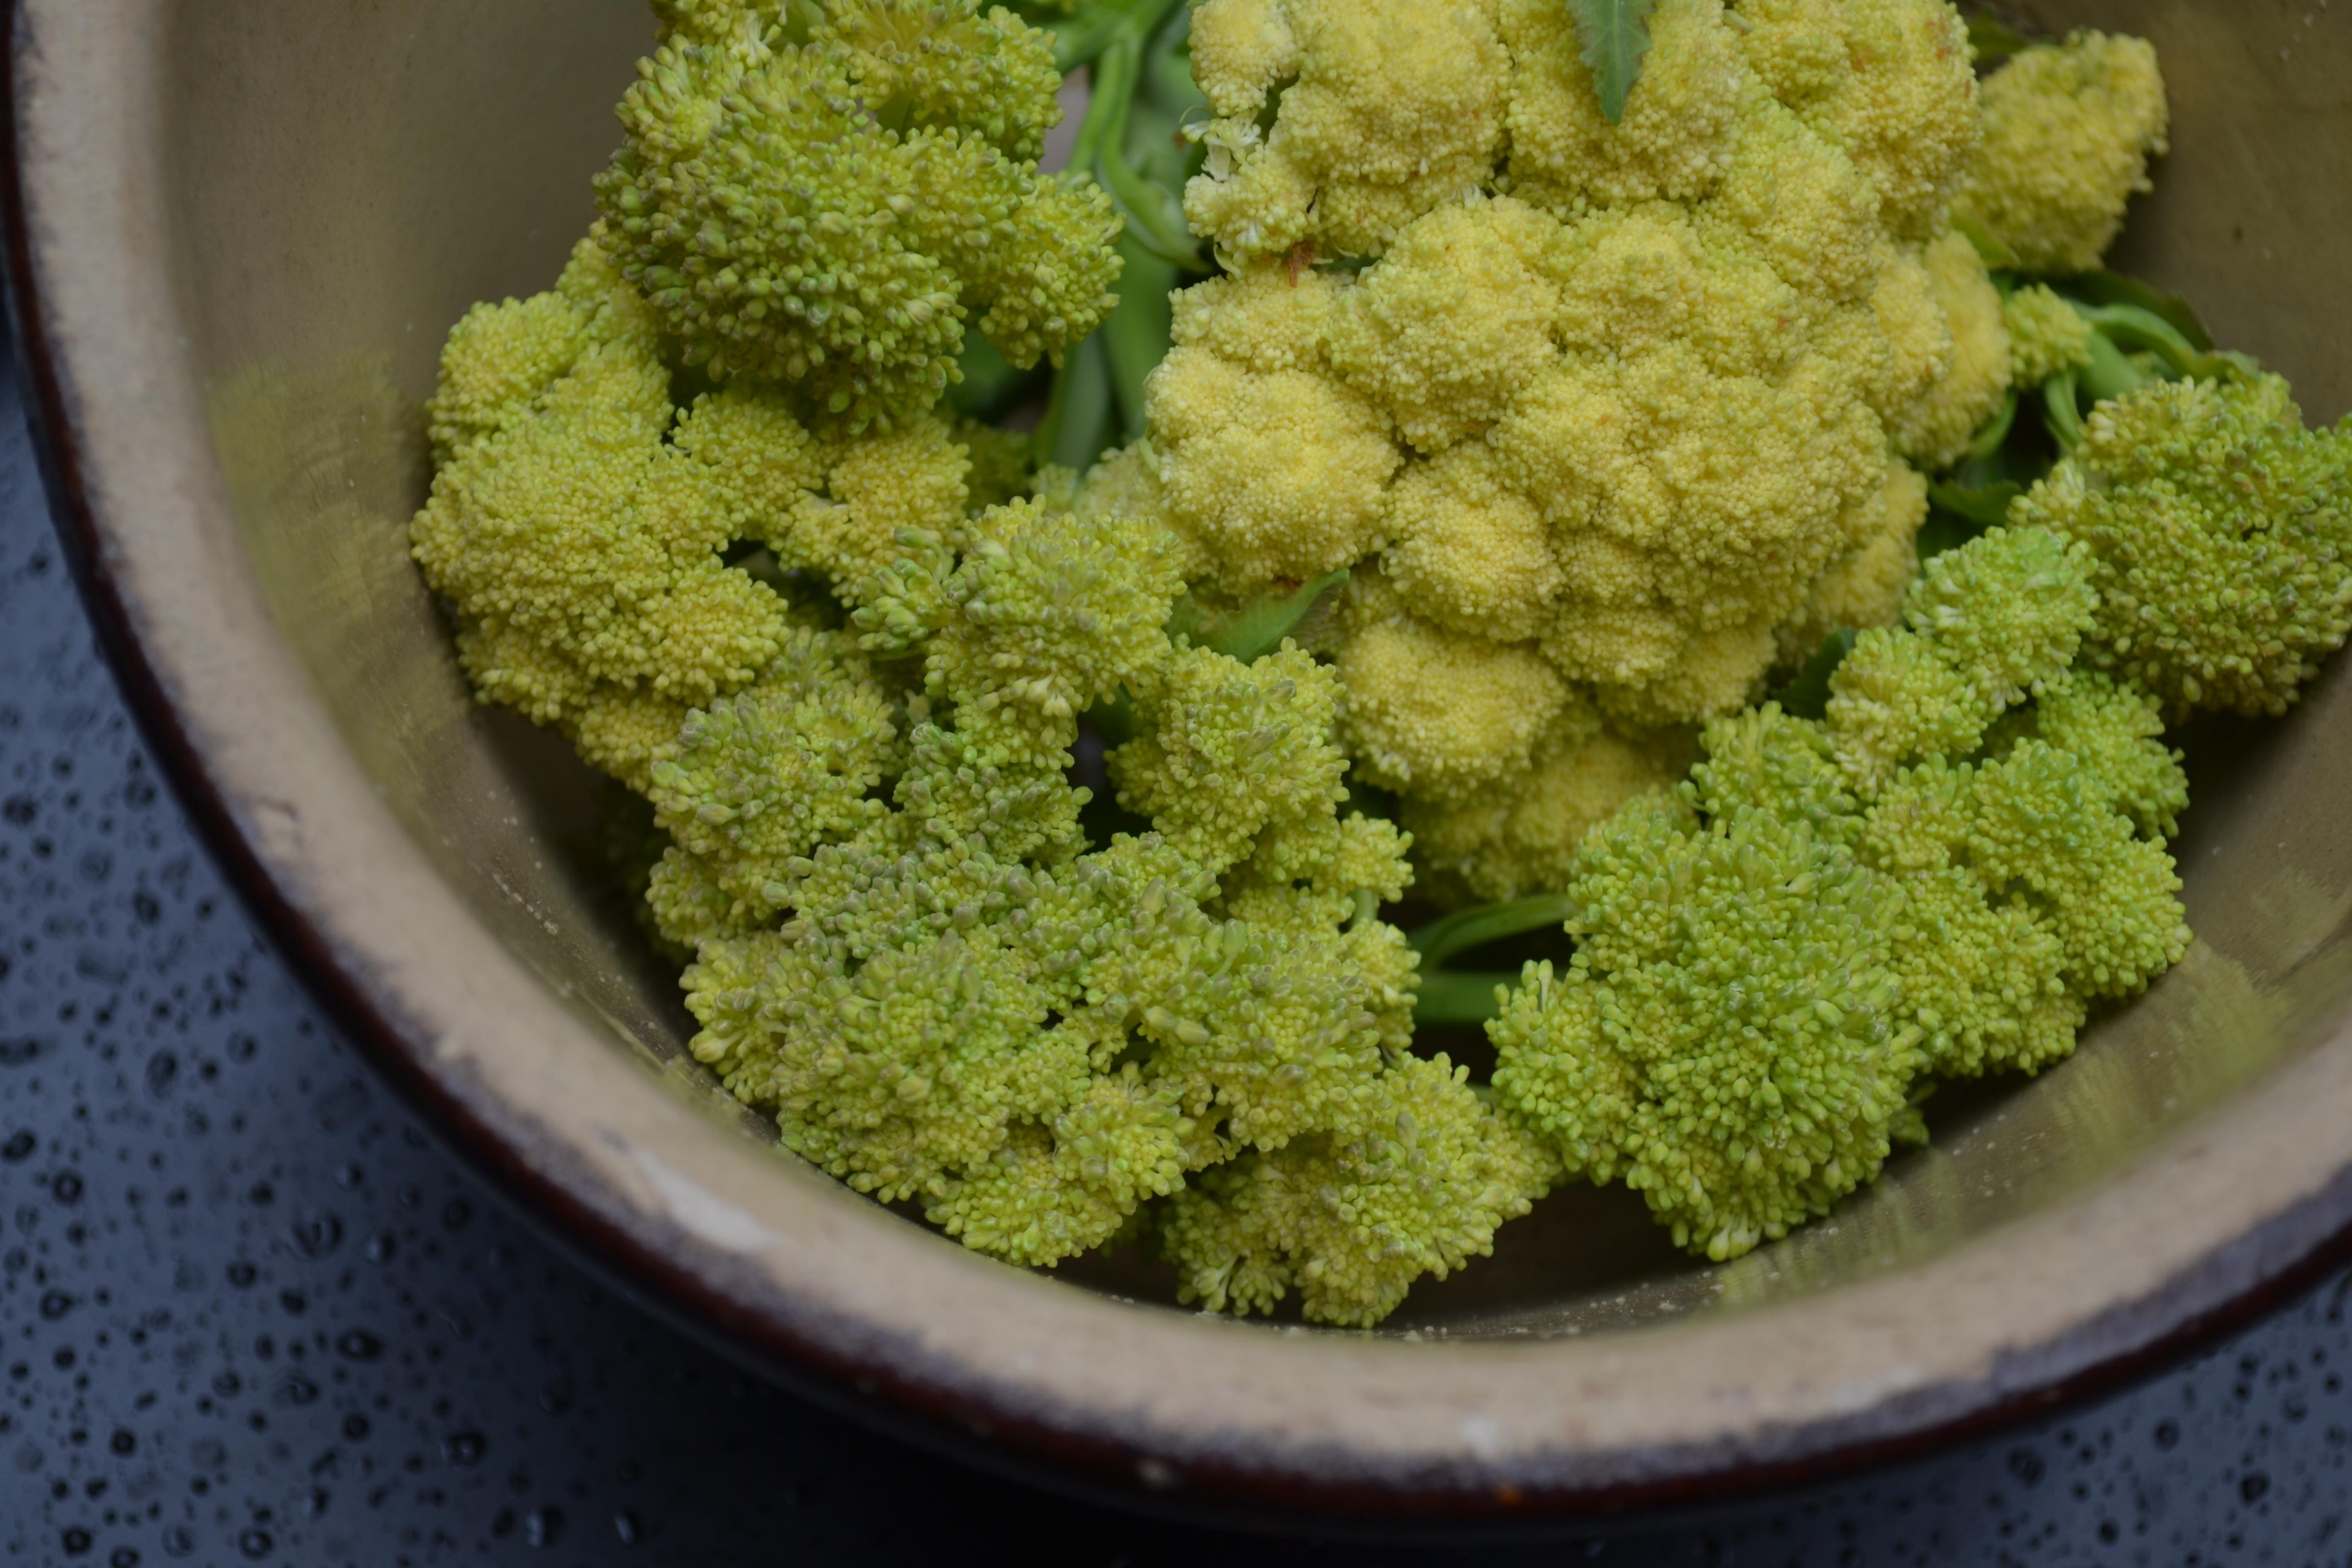 Nine Star perennial broccoli harvest